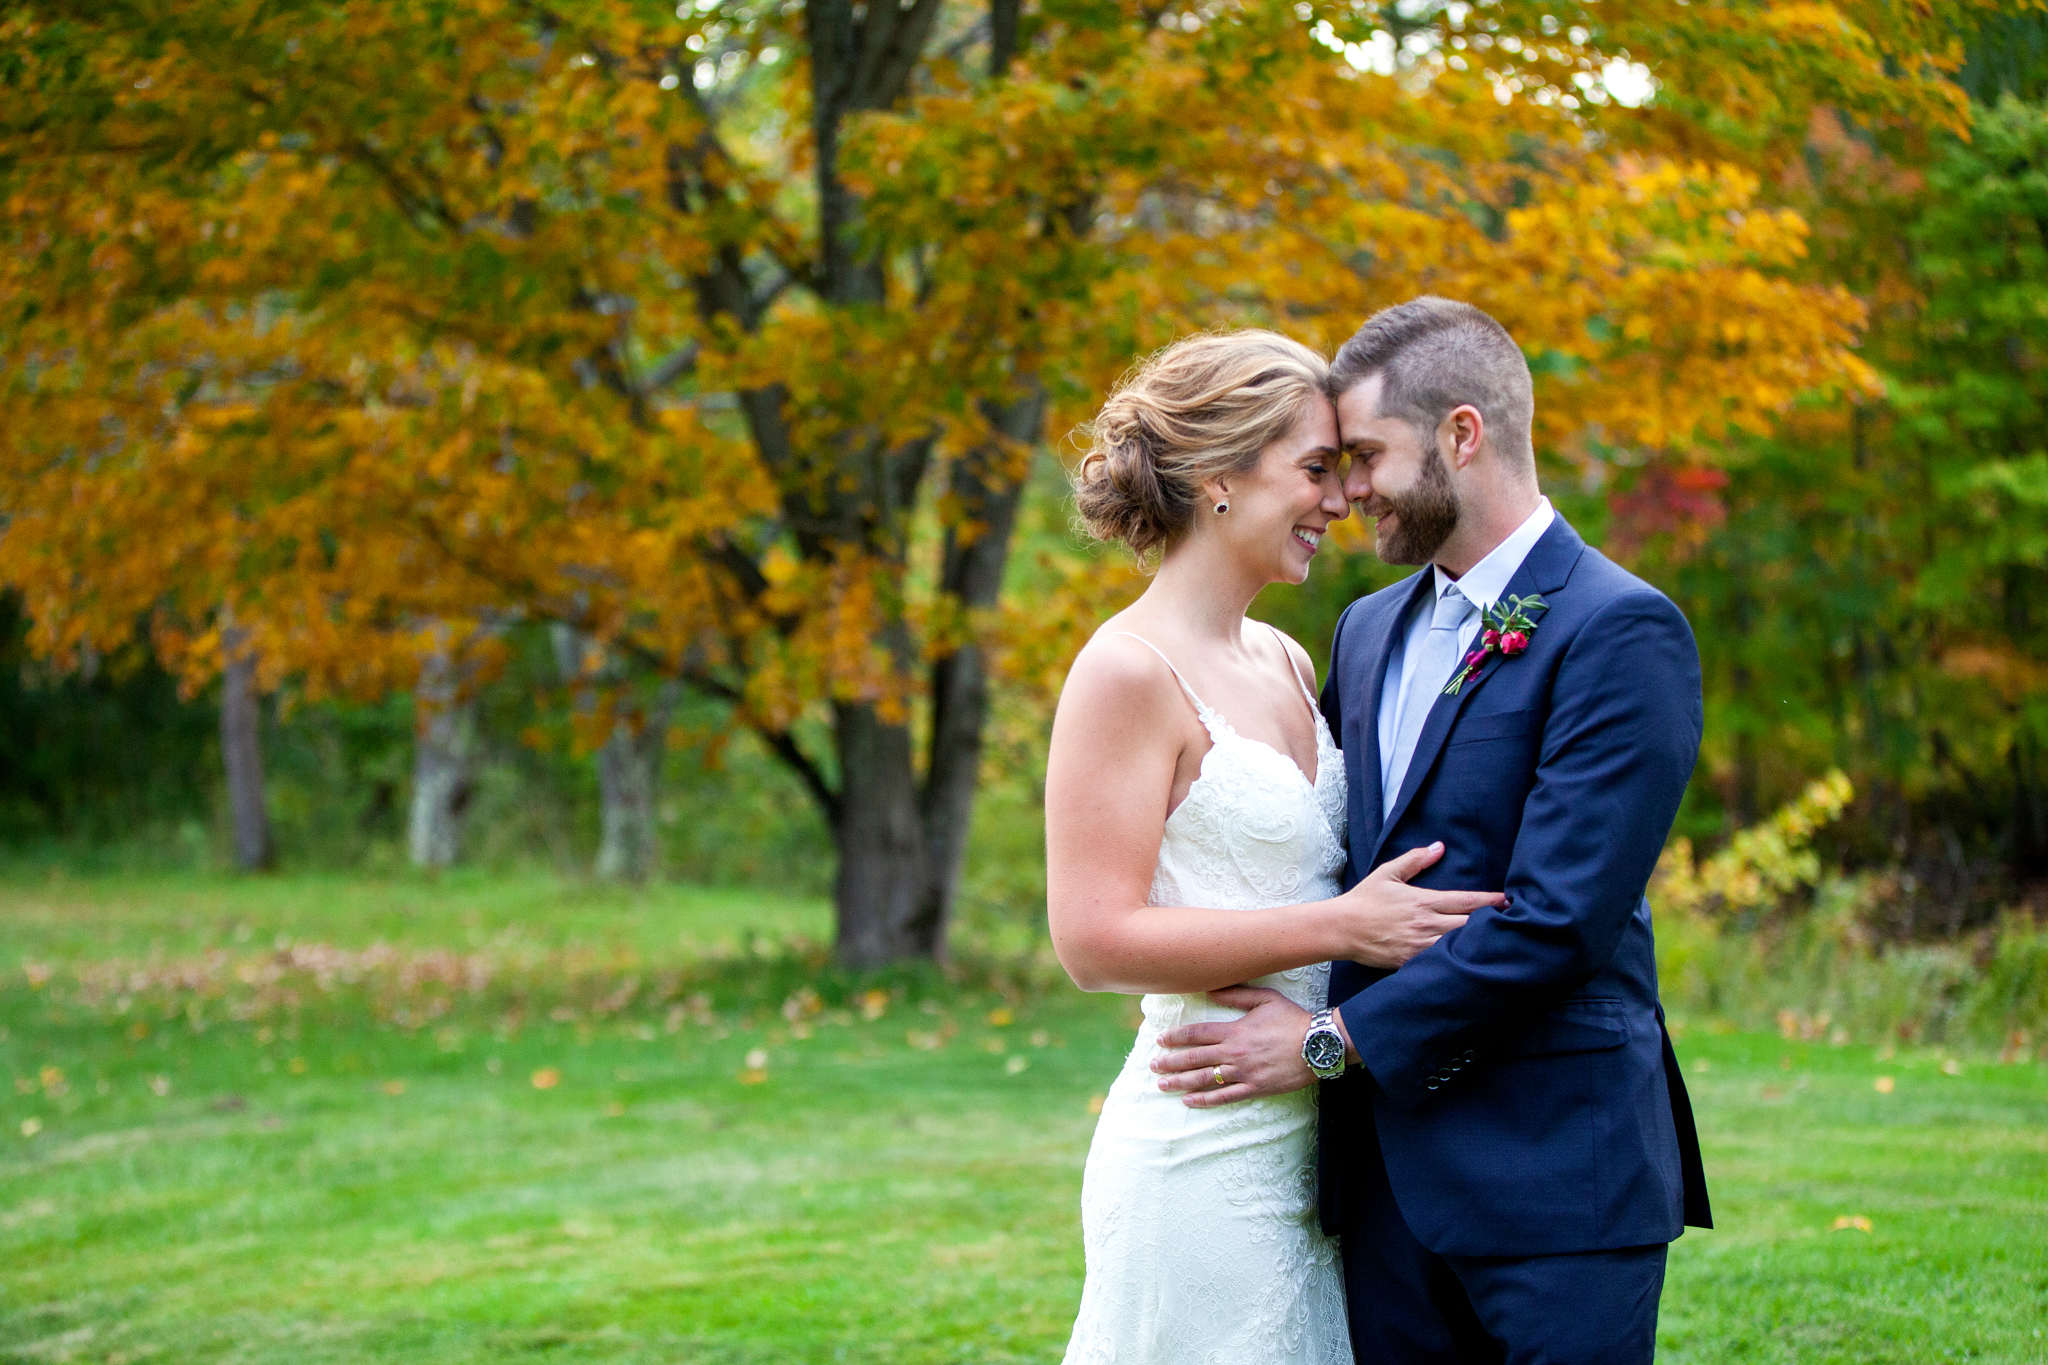 maine-farm-wedding-photographer-stepheneycollins-180.jpg